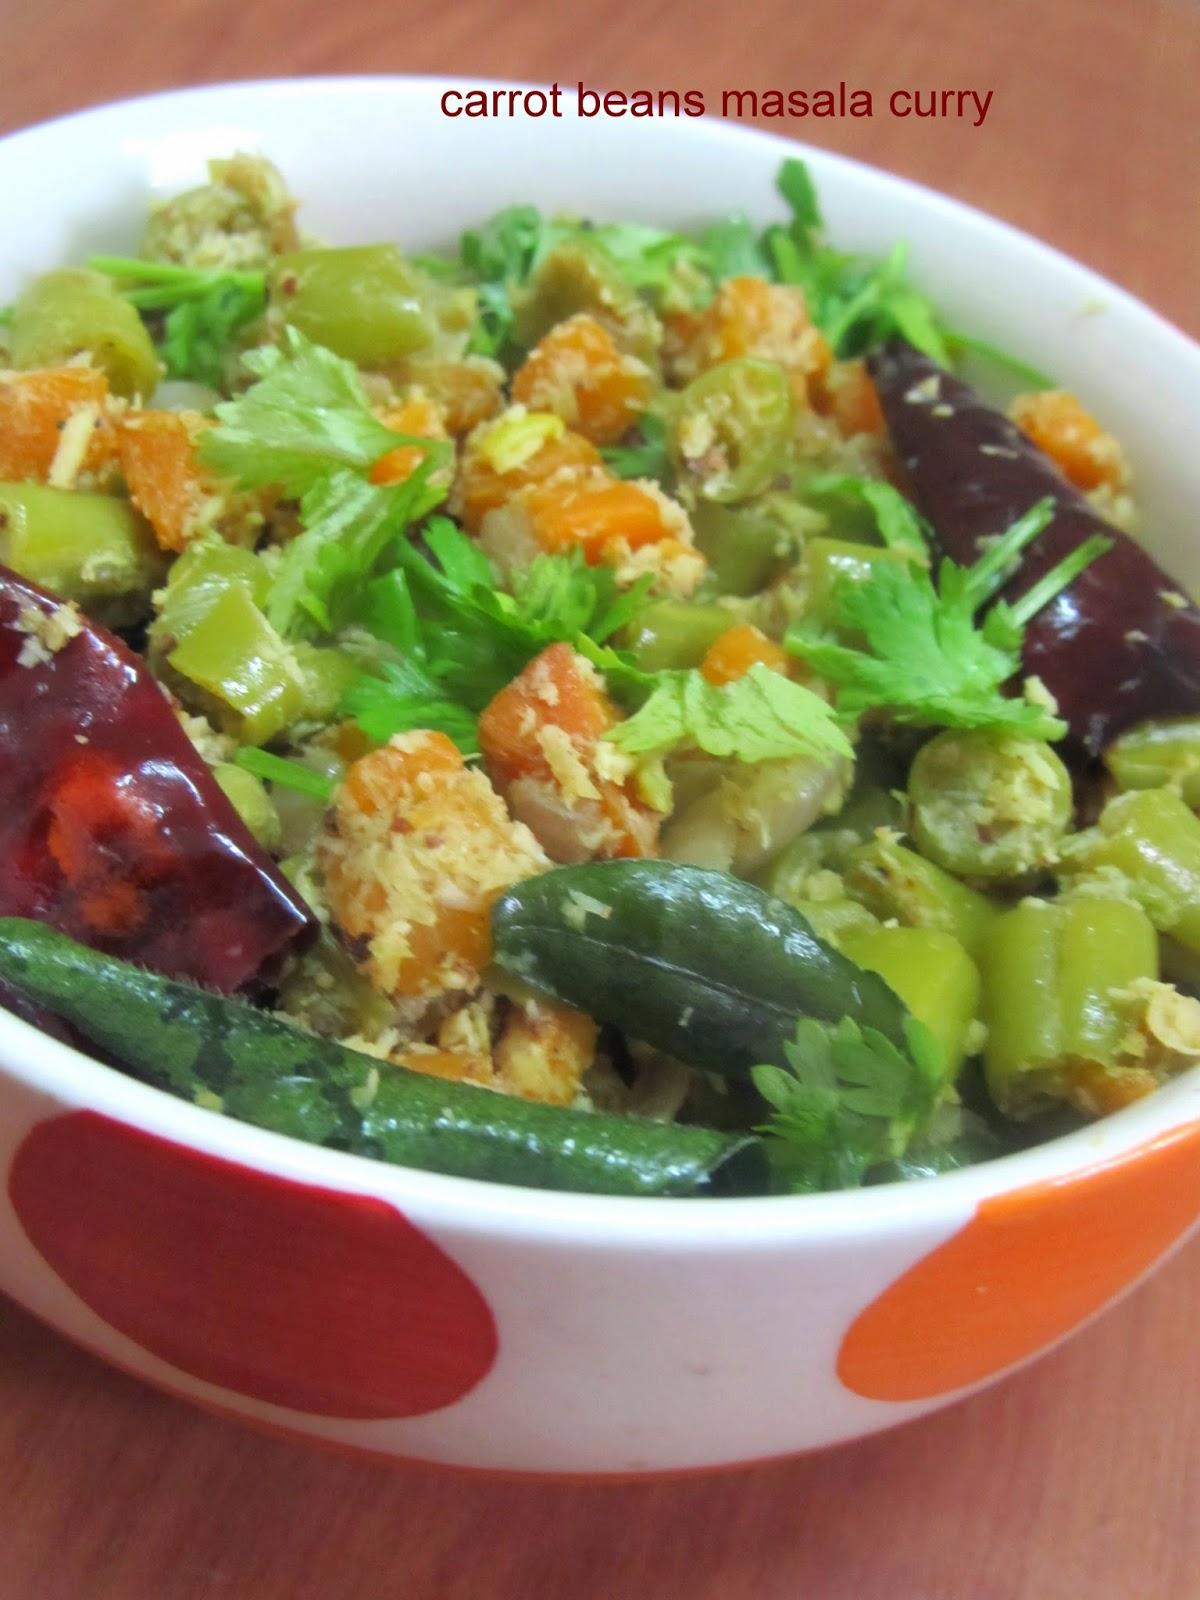 carrot beans masala curry